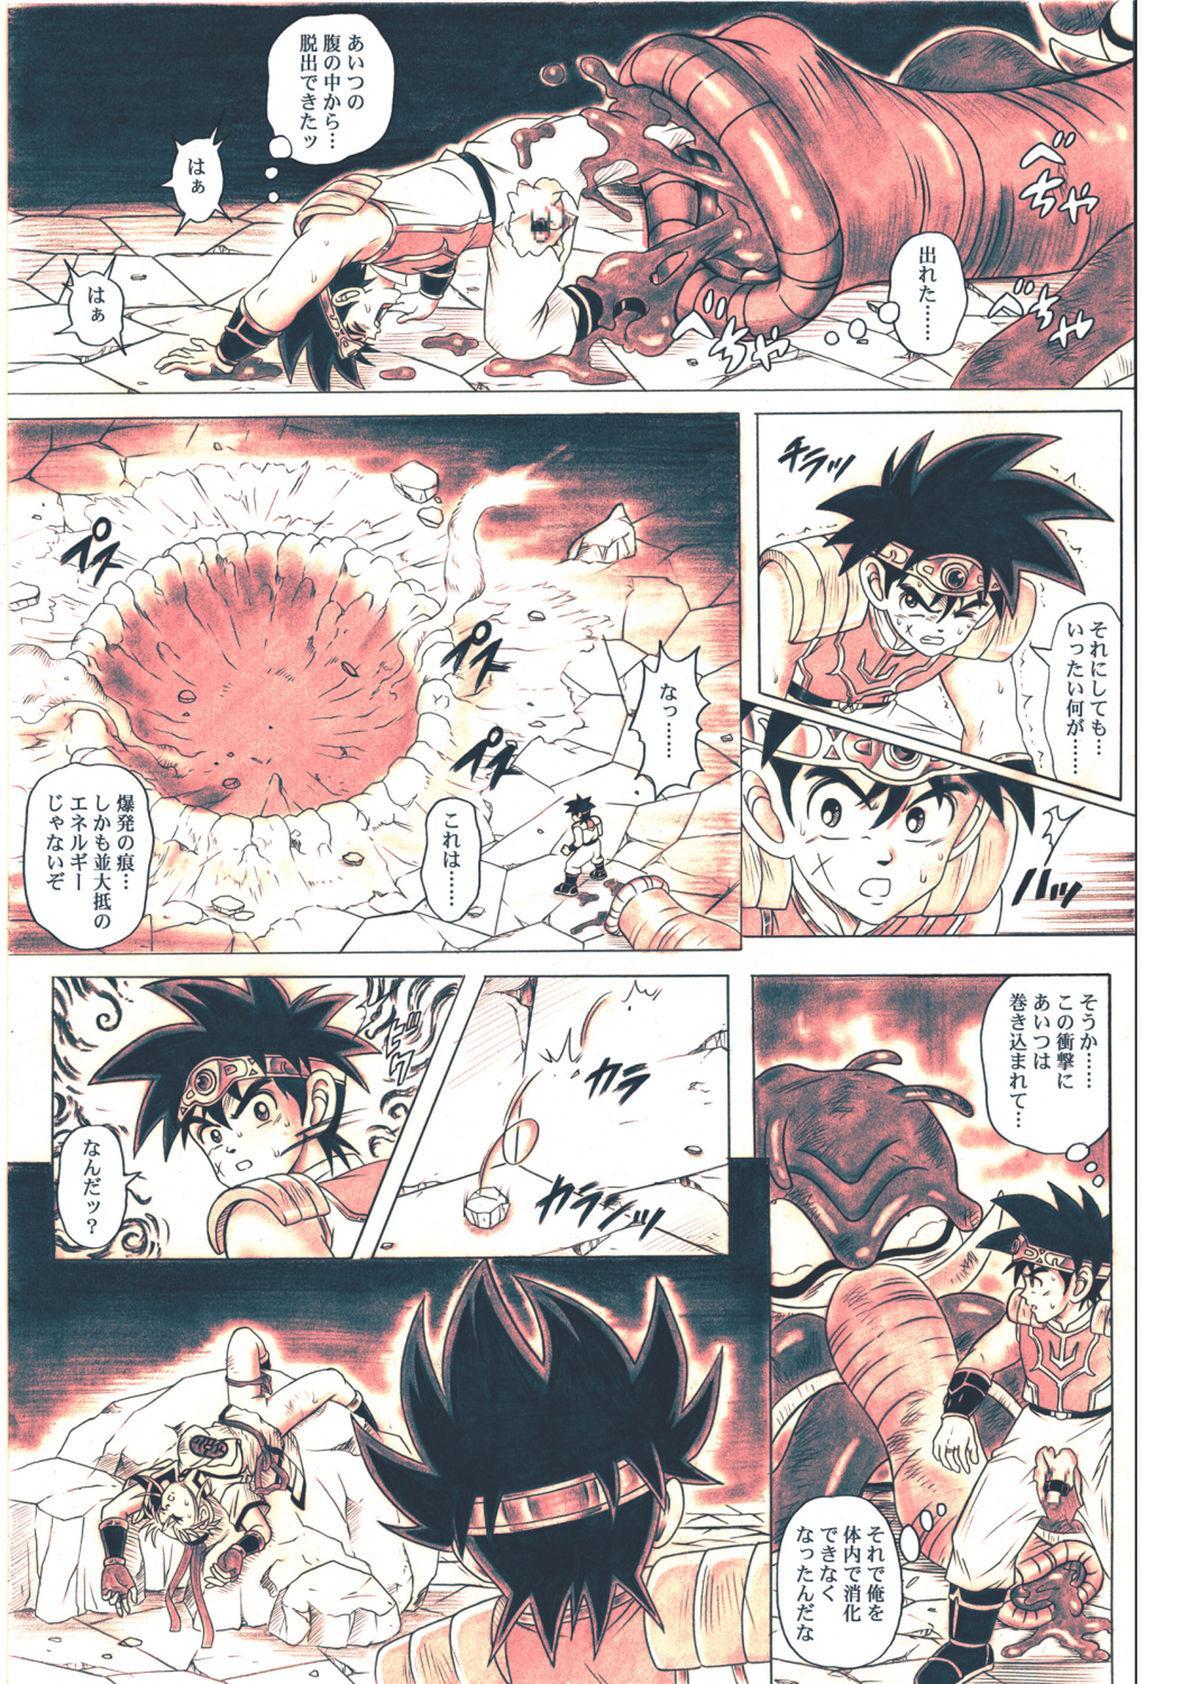 [Cyclone (Reizei, Izumi)] STAR TAC IDO ~Youkuso Haja no Doukutsu he~ Chuuhen Download edition (Dragon Warrior: Dai's Great Adventure) [Digital] 90